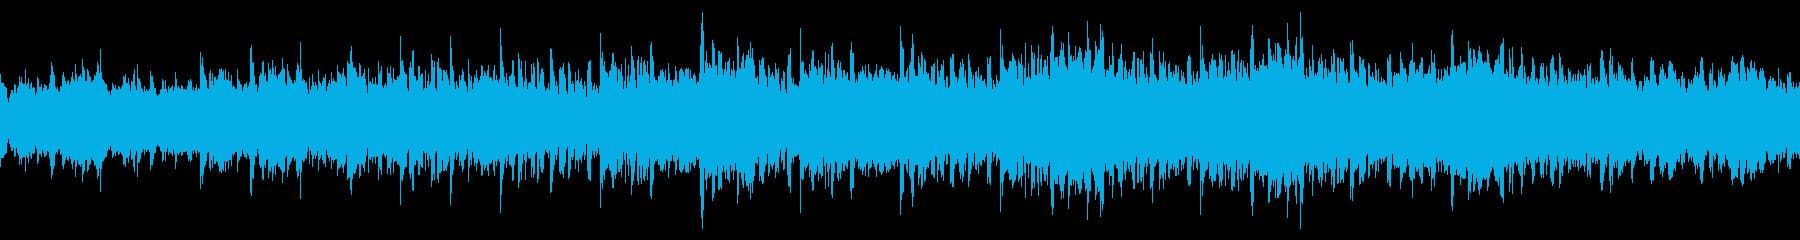 BGMに最適なシンセサイザーの曲の再生済みの波形